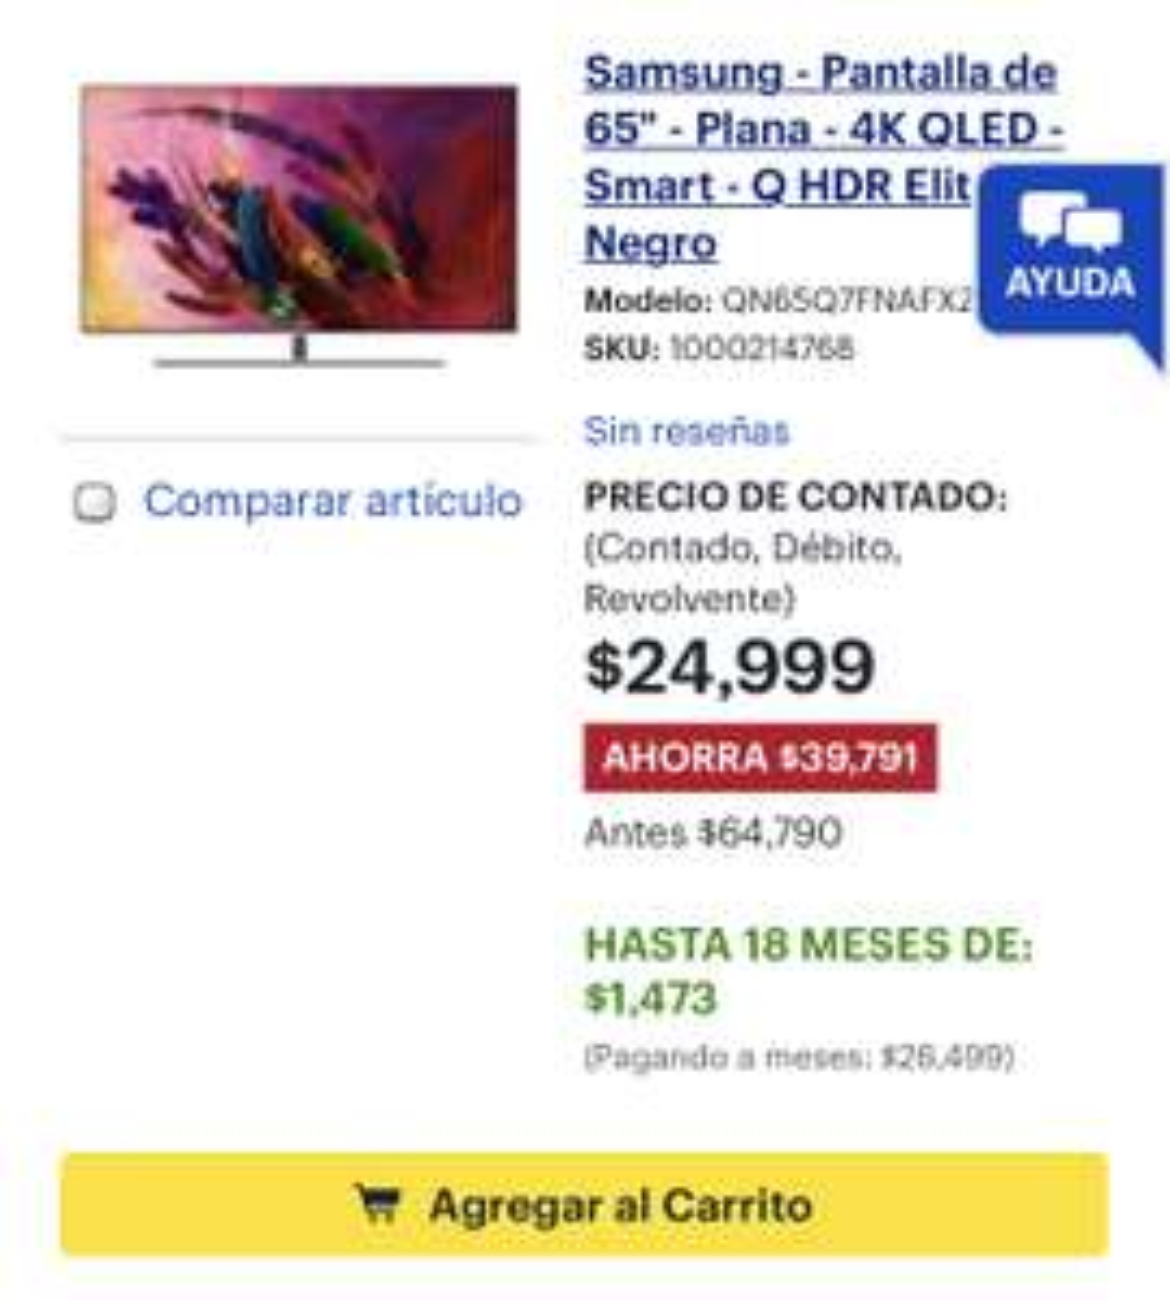 "Best Buy: Samsung - Pantalla de 65"" - Plana - 4K QLED - Smart - Q HDR Elite - Negro"